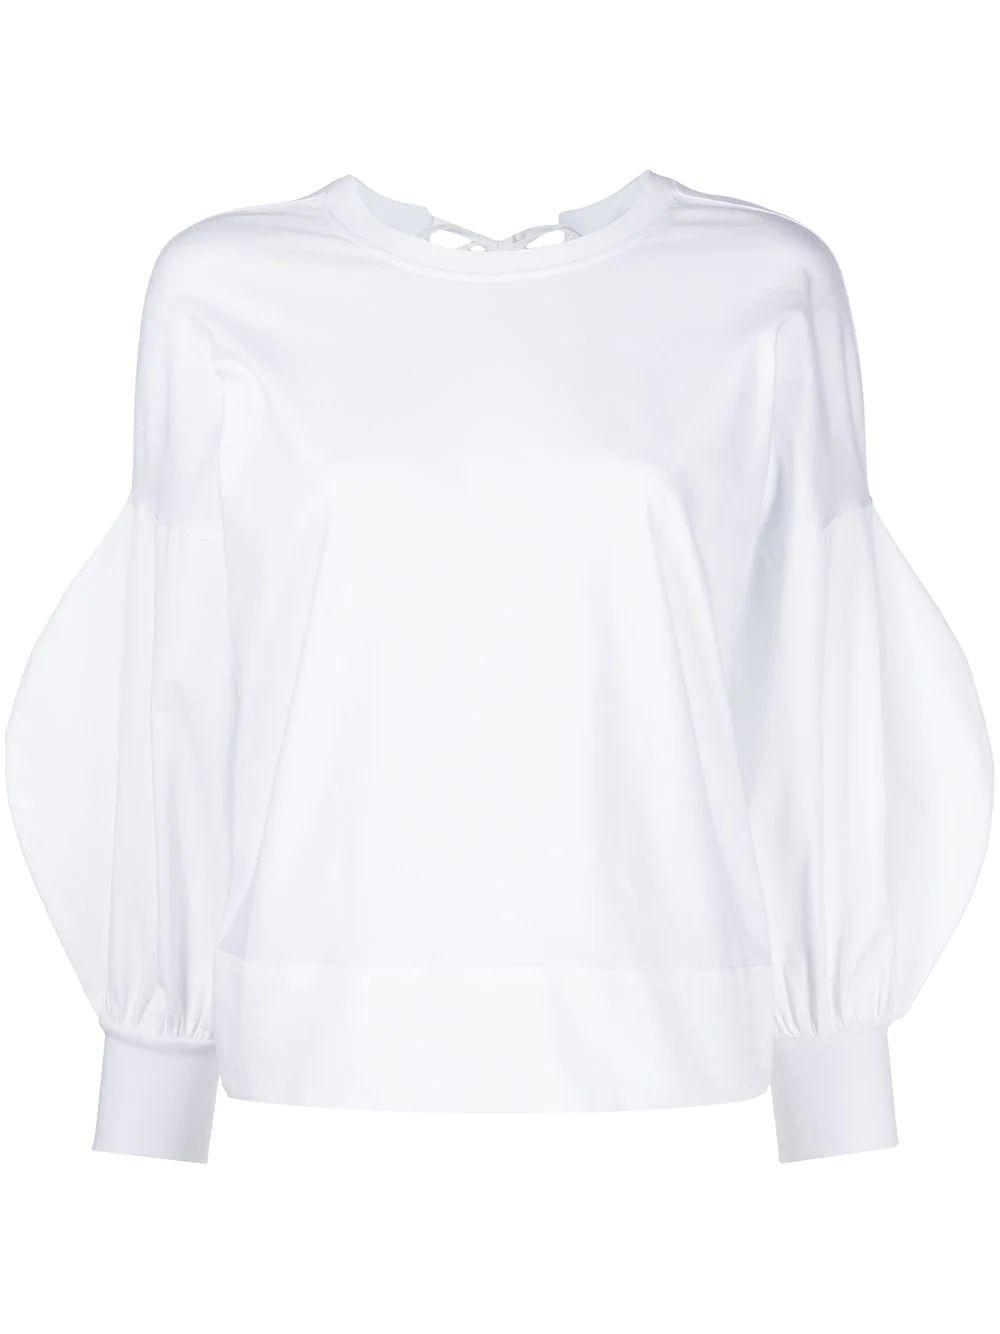 Blouson Sleeve Top